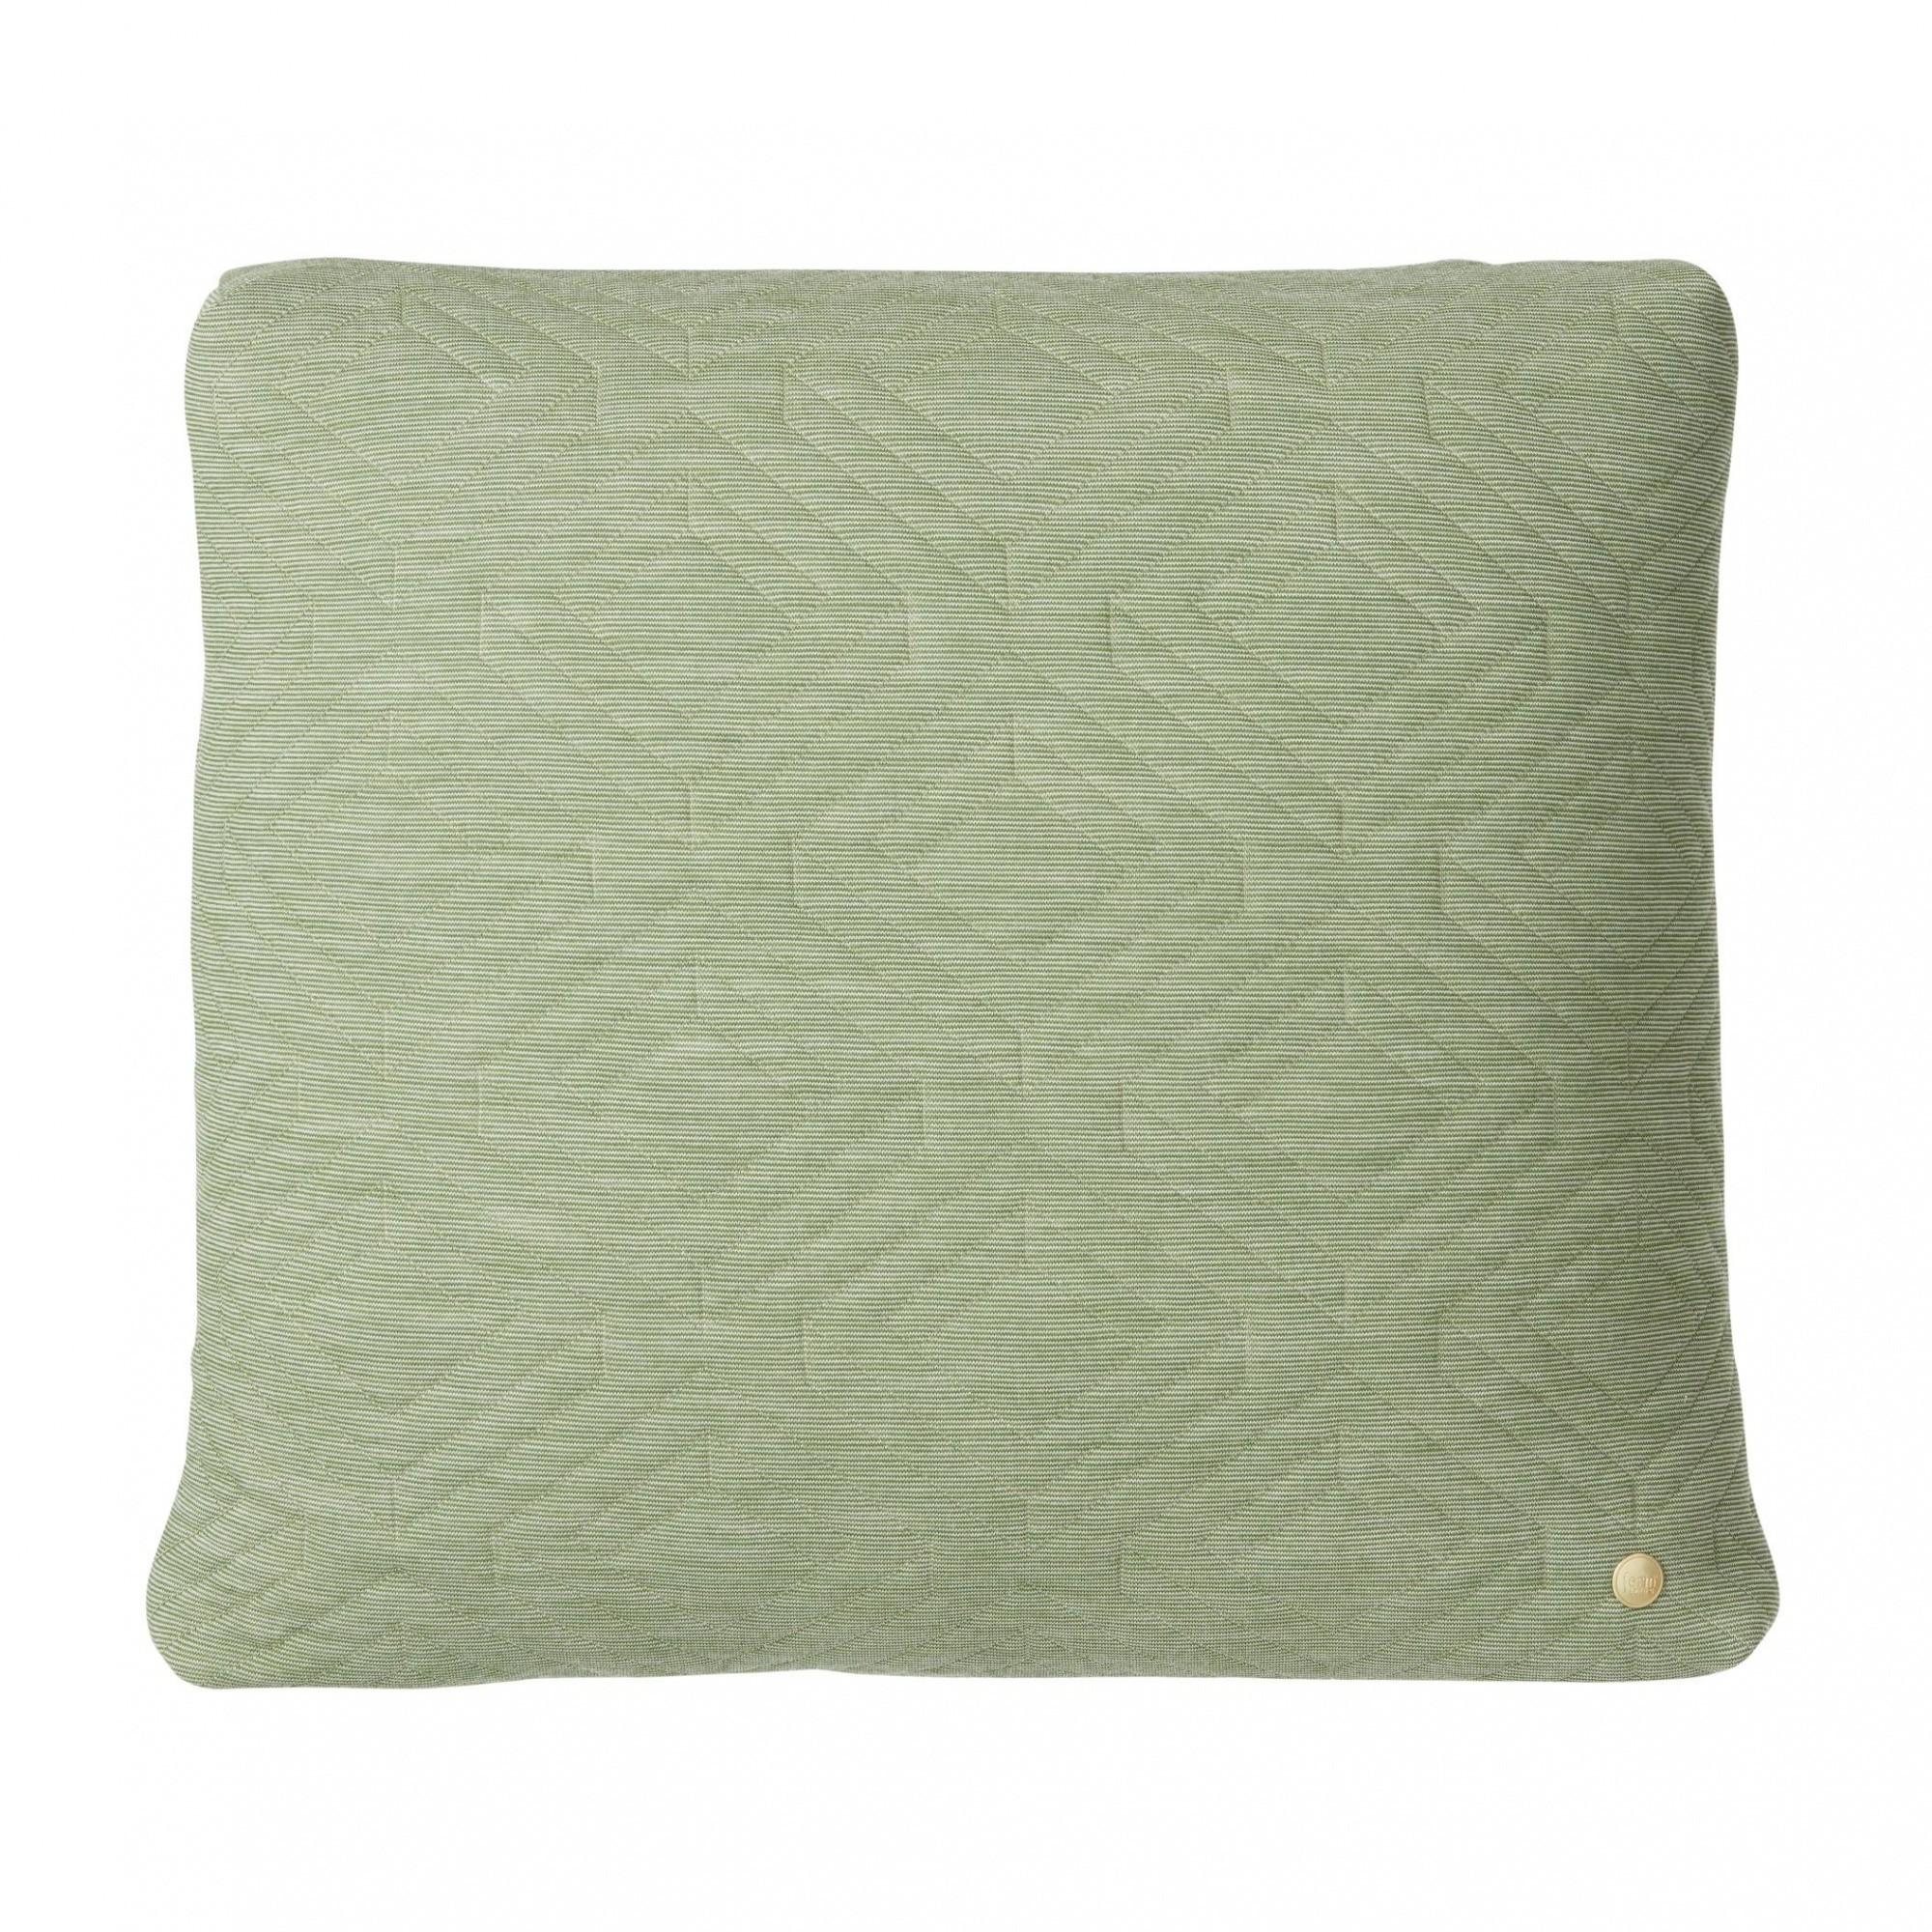 ferm living quilt kissen 45x45cm ambientedirect. Black Bedroom Furniture Sets. Home Design Ideas